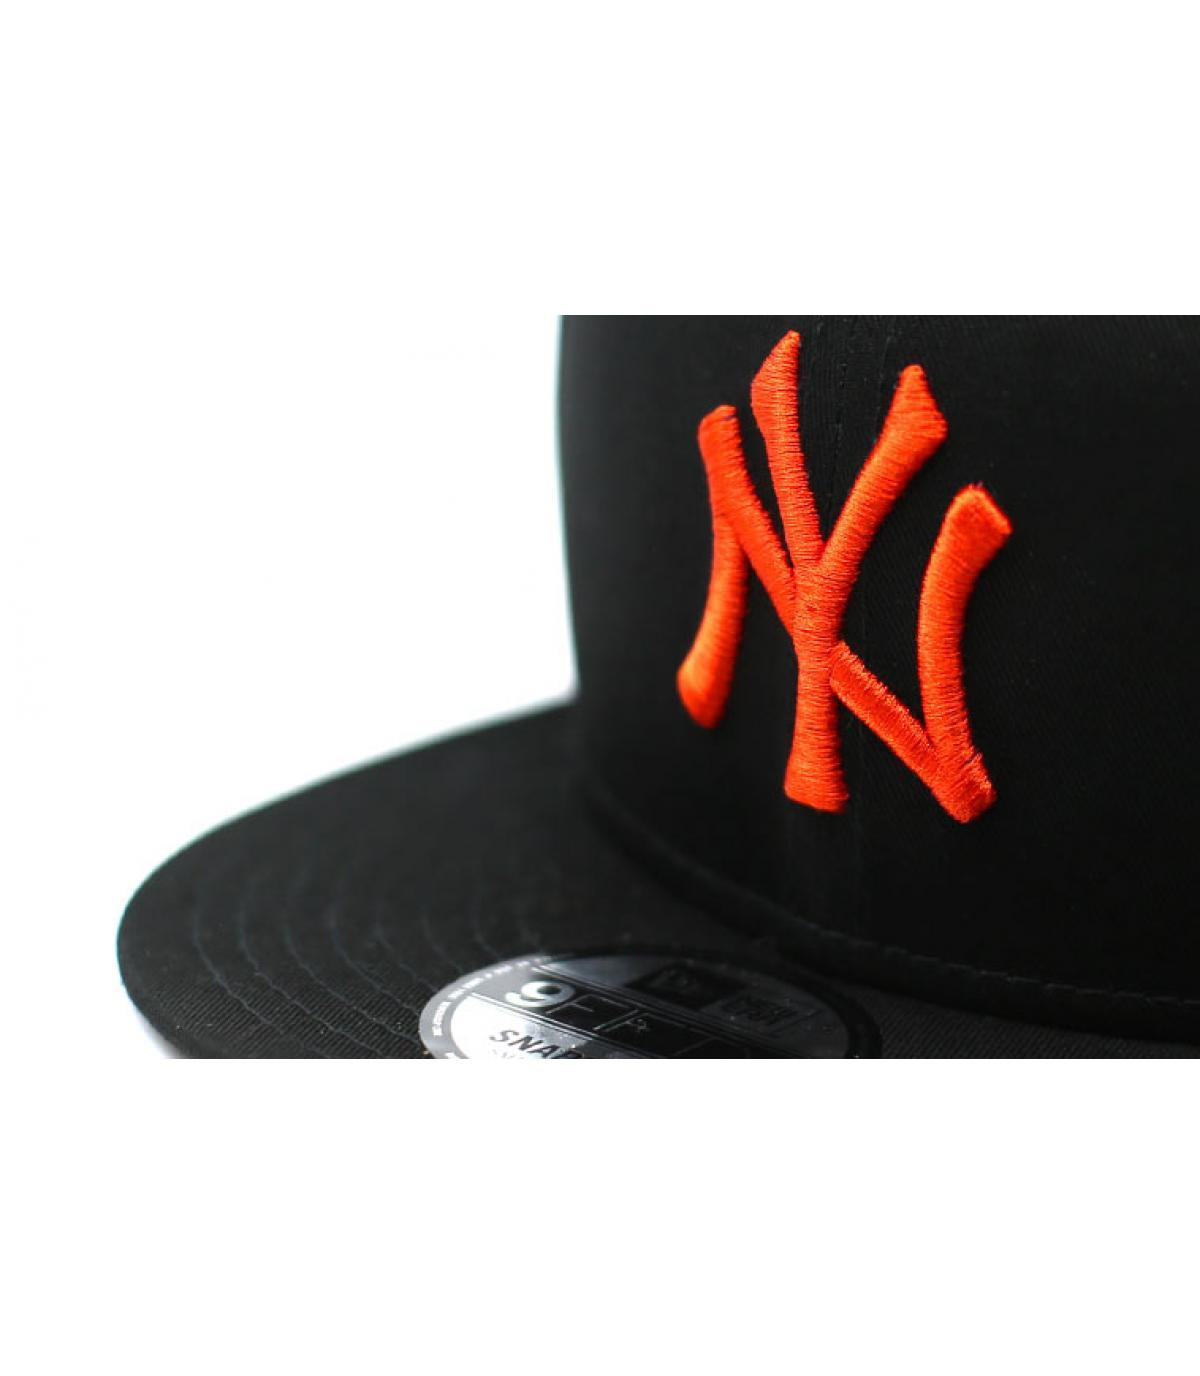 Details League Ess NY 9Fifty black orange - afbeeling 3